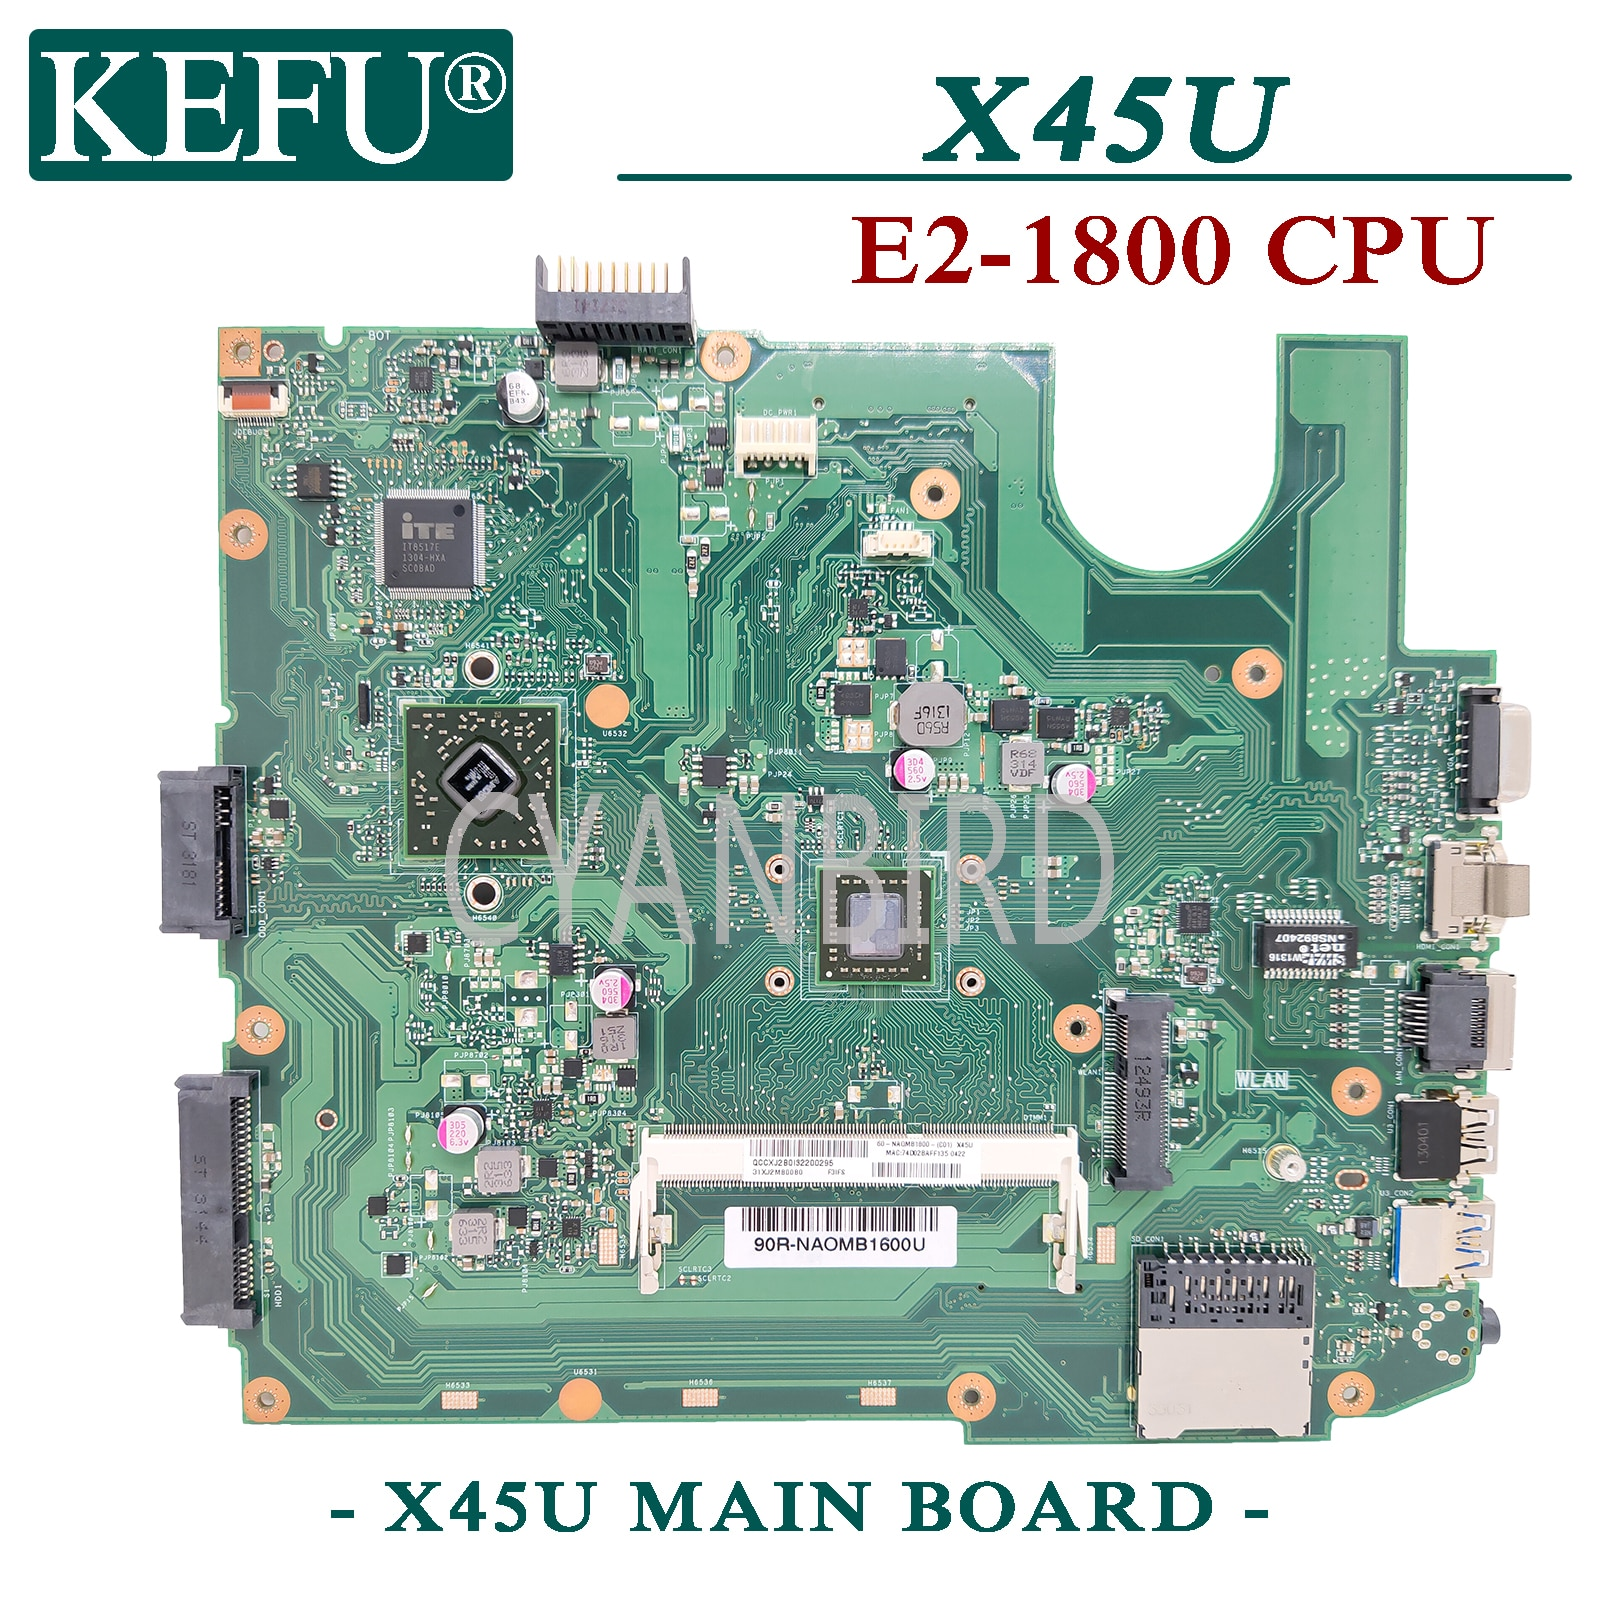 KEFU X45U الأصلي اللوحة الرئيسية لشركة آسوس X45U A45U مع E2-1800 وحدة المعالجة المركزية اللوحة الأم للكمبيوتر المحمول